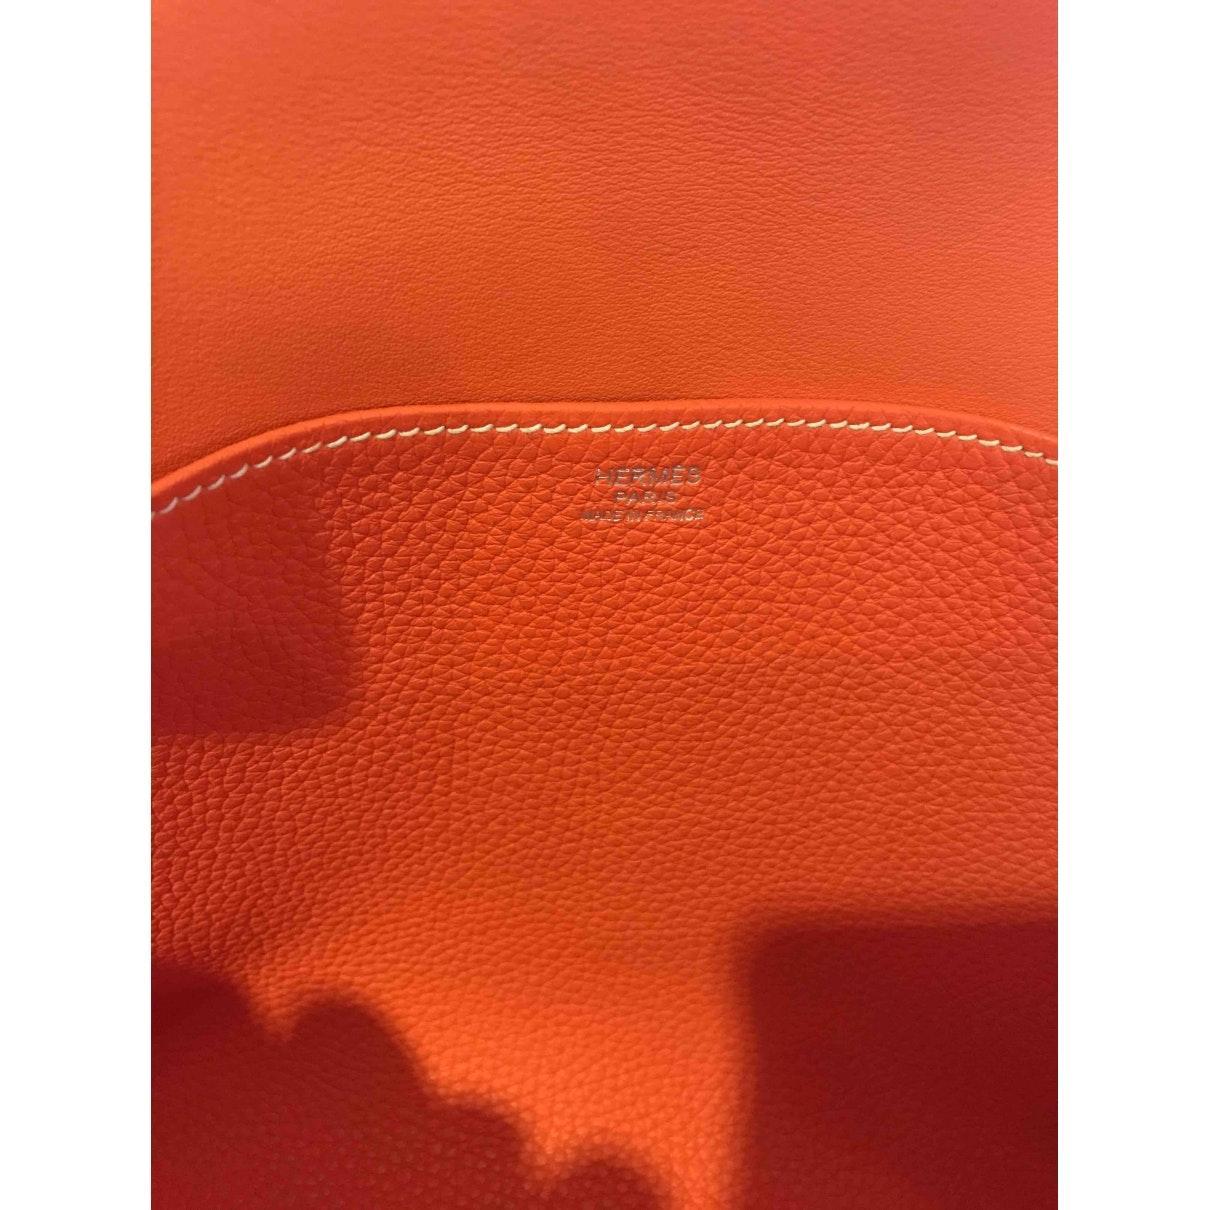 Hermès Leder Halzan Leder Handtaschen in Orange lKIVx